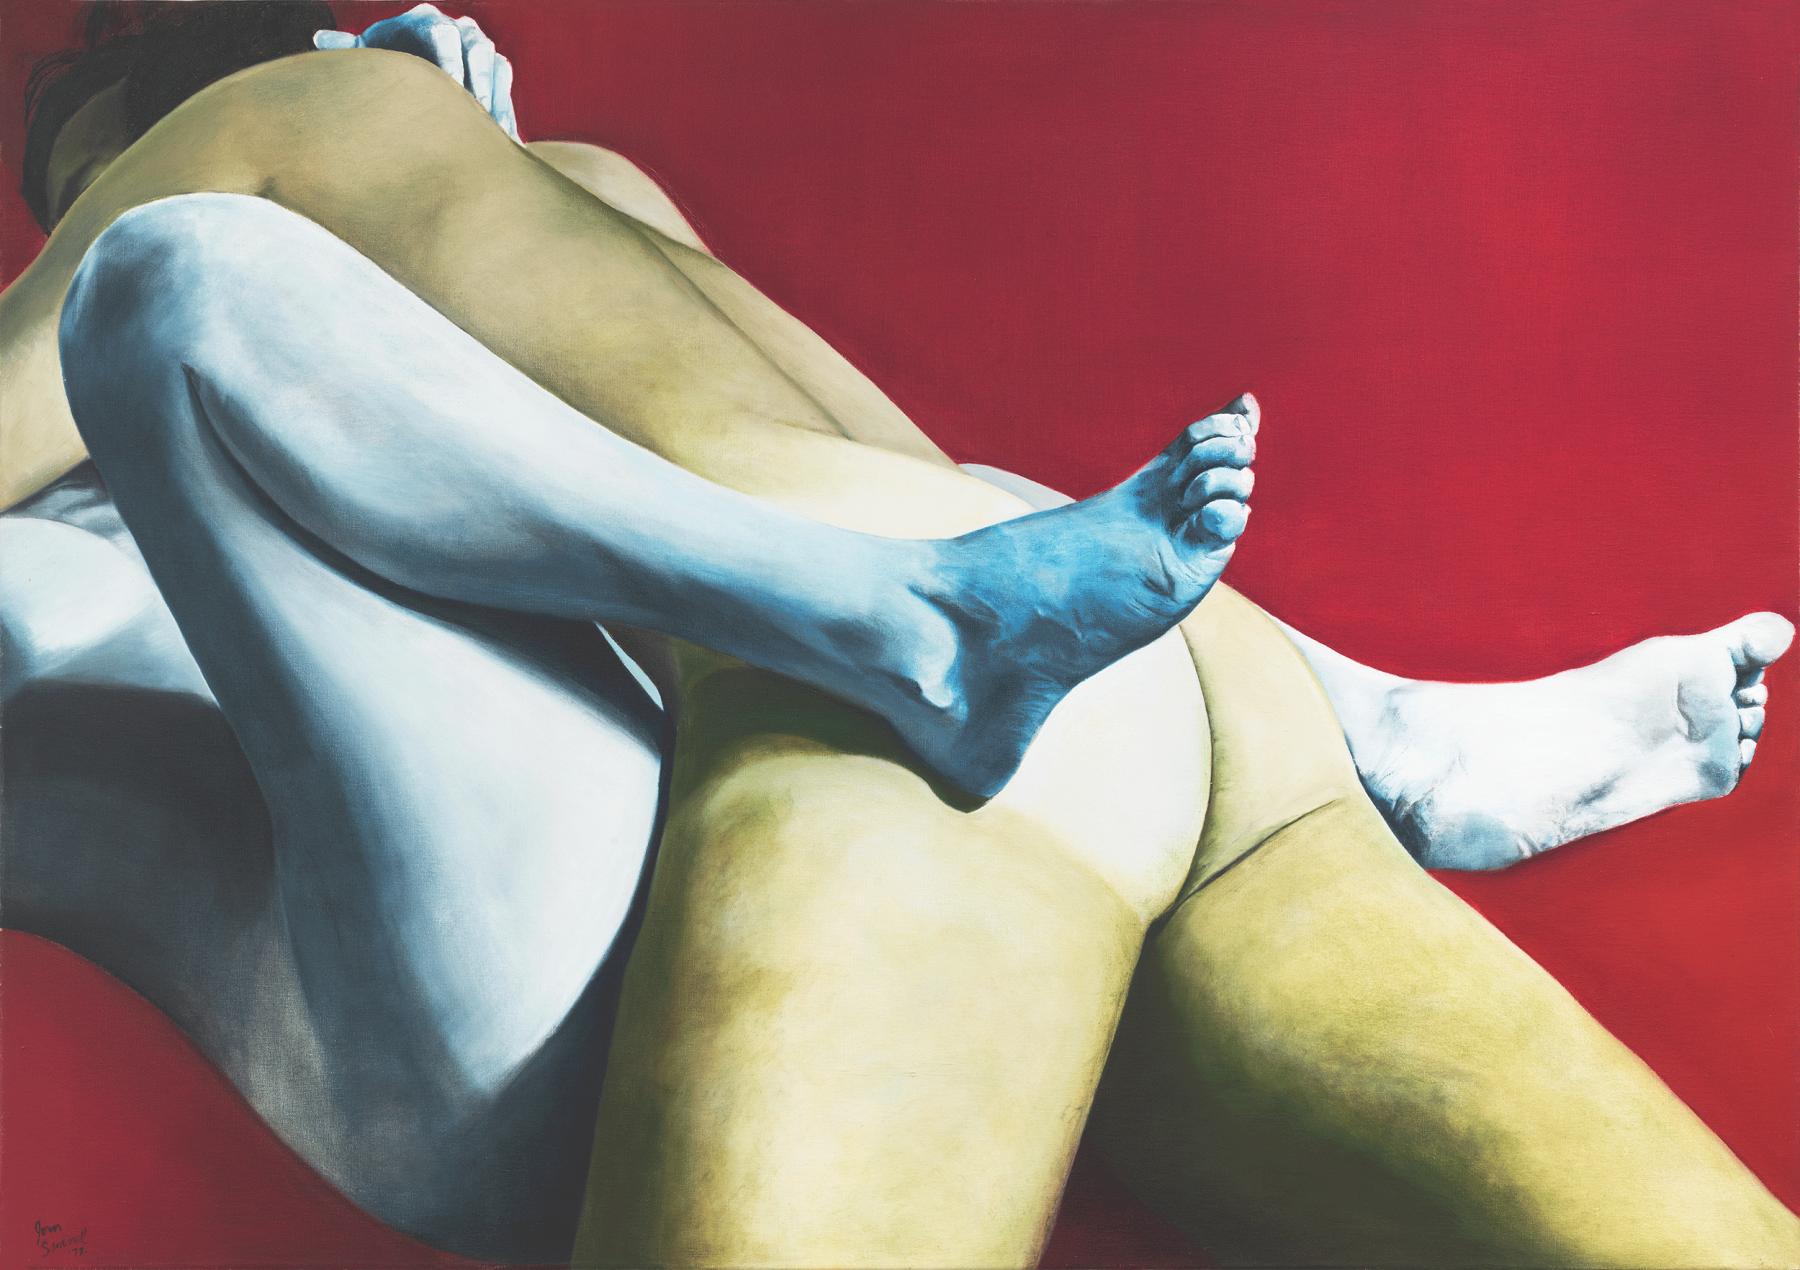 Joan Semmel Red, White, and Blue, 1973